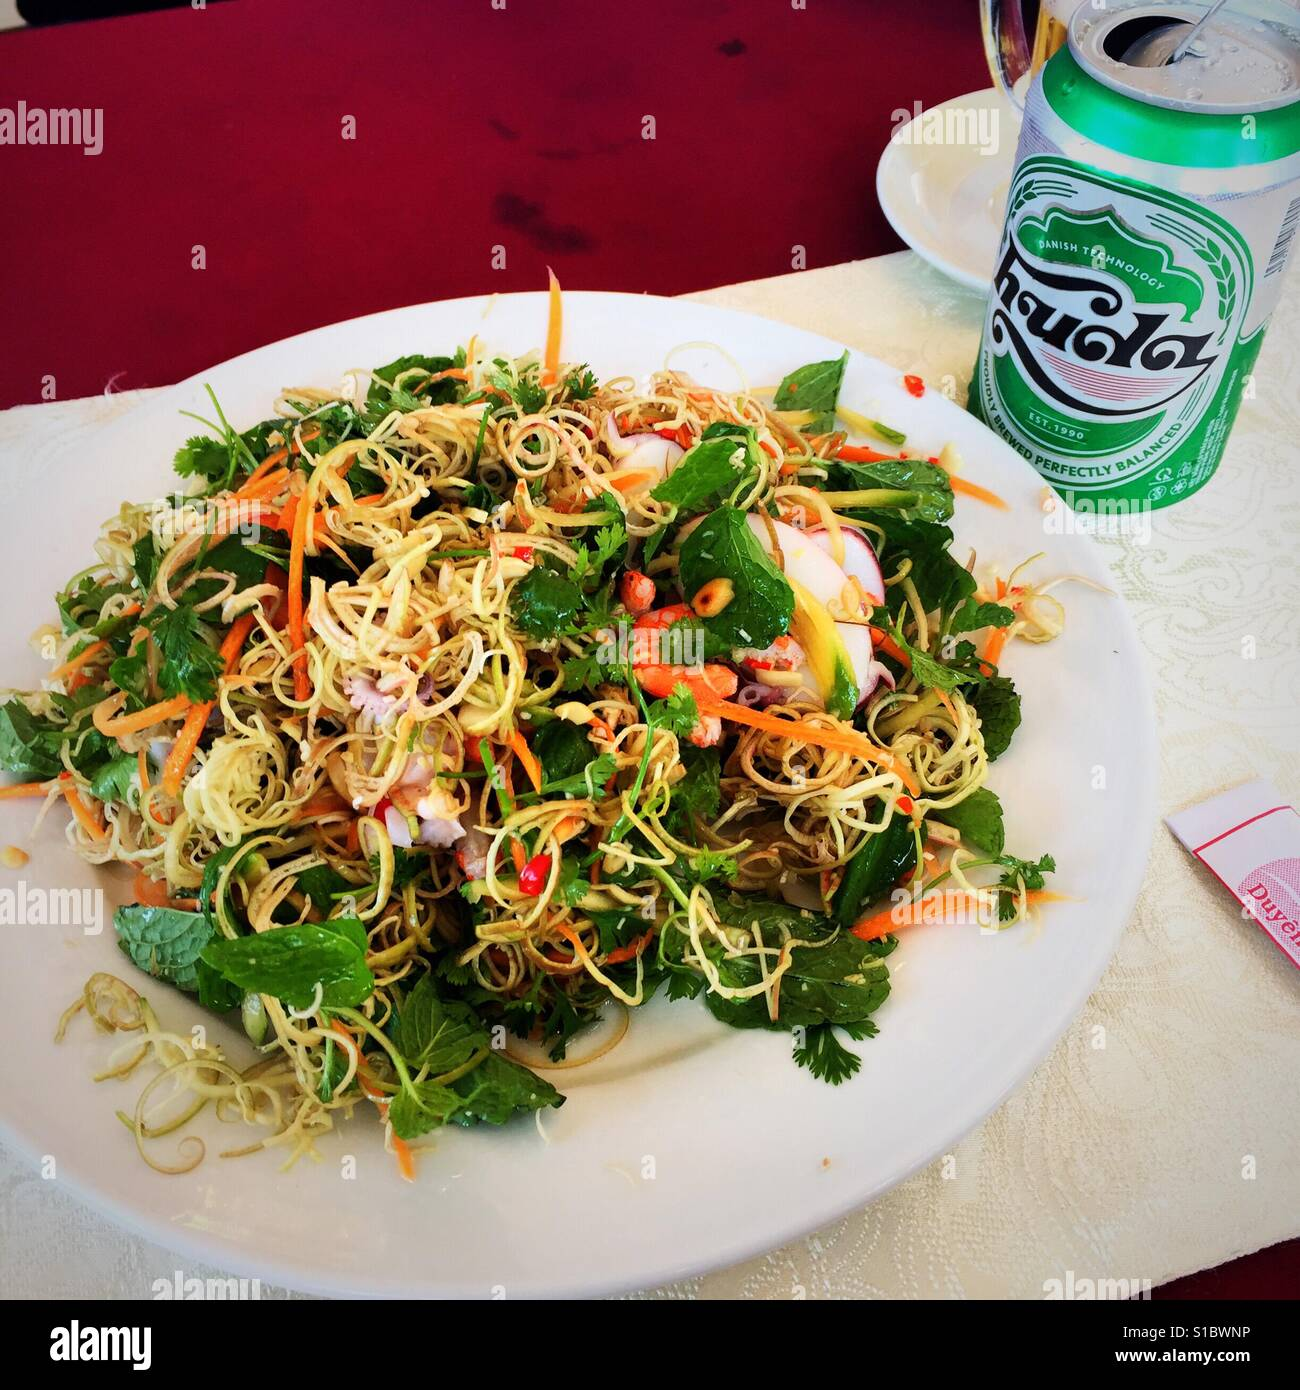 Stock Photo - Traditional Vietnamese salad and Huda beer